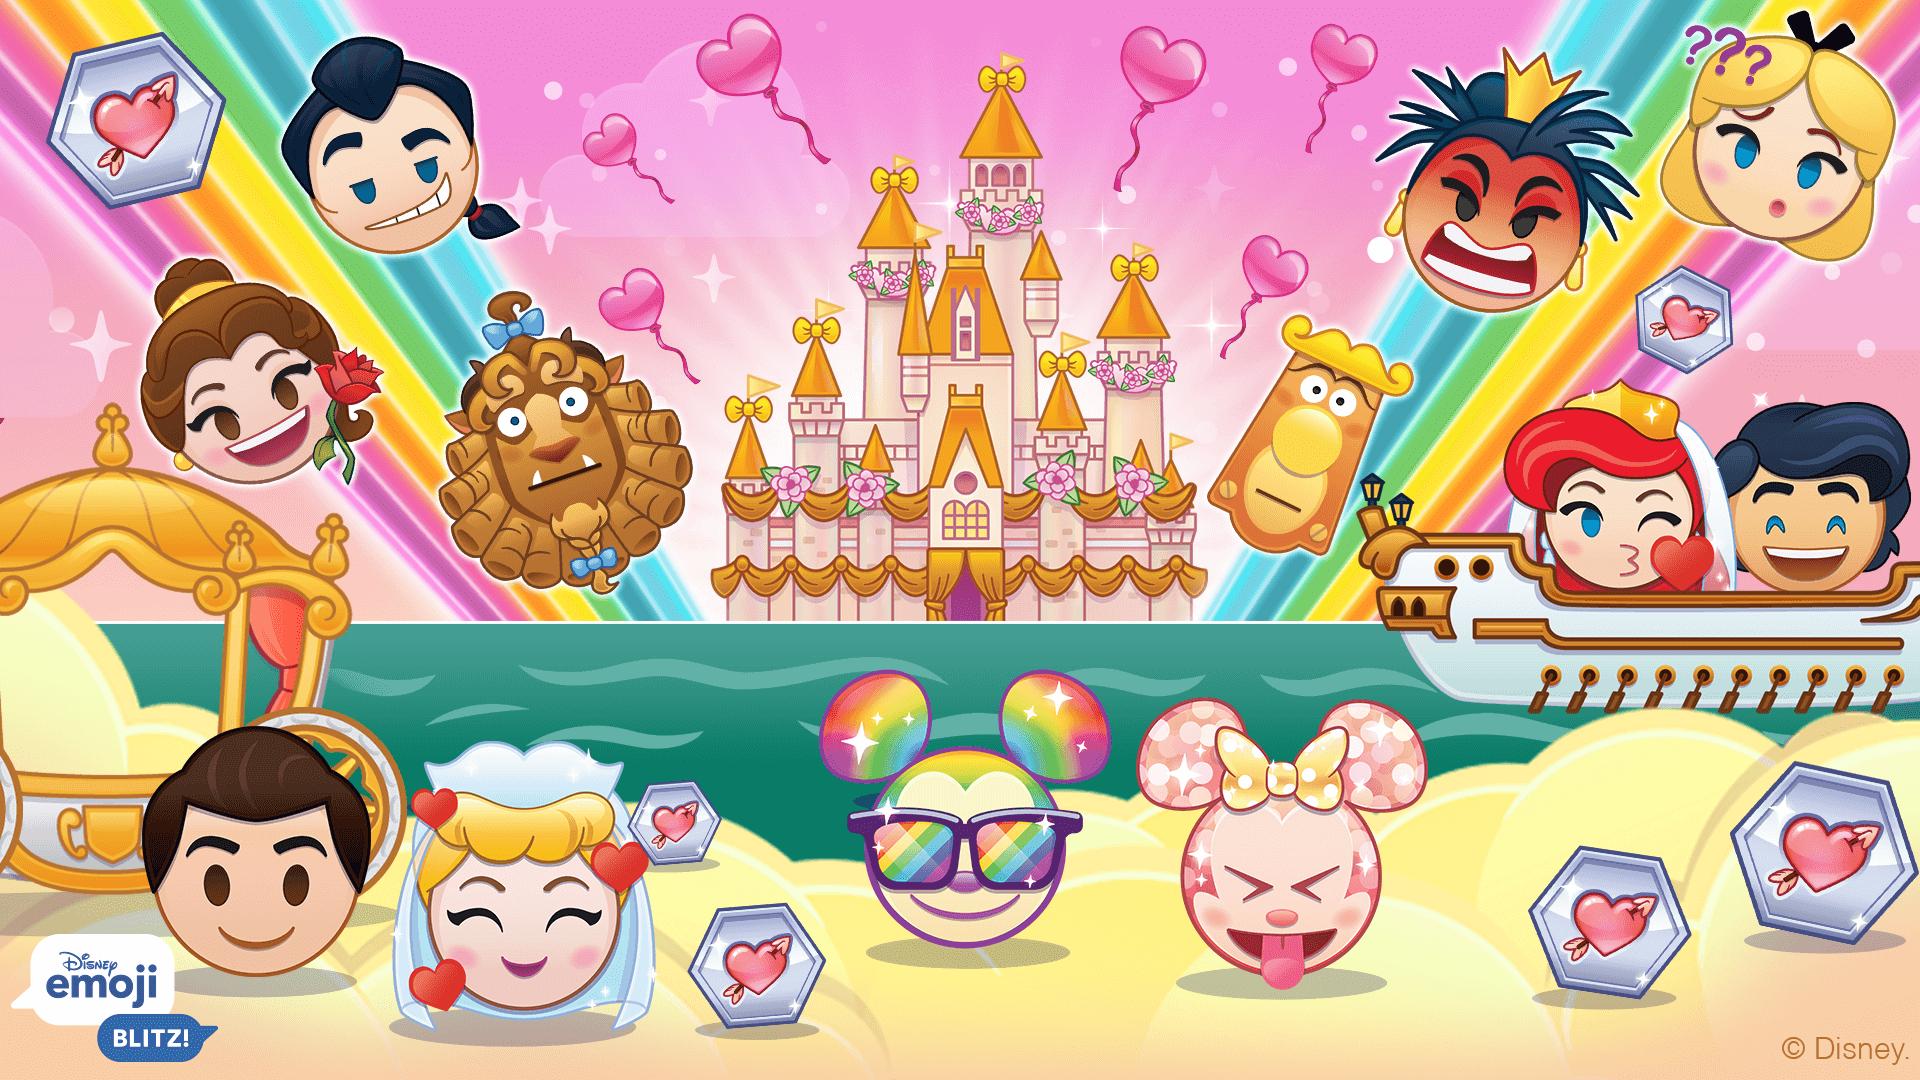 February 2021 Update, Disney Emoji Blitz